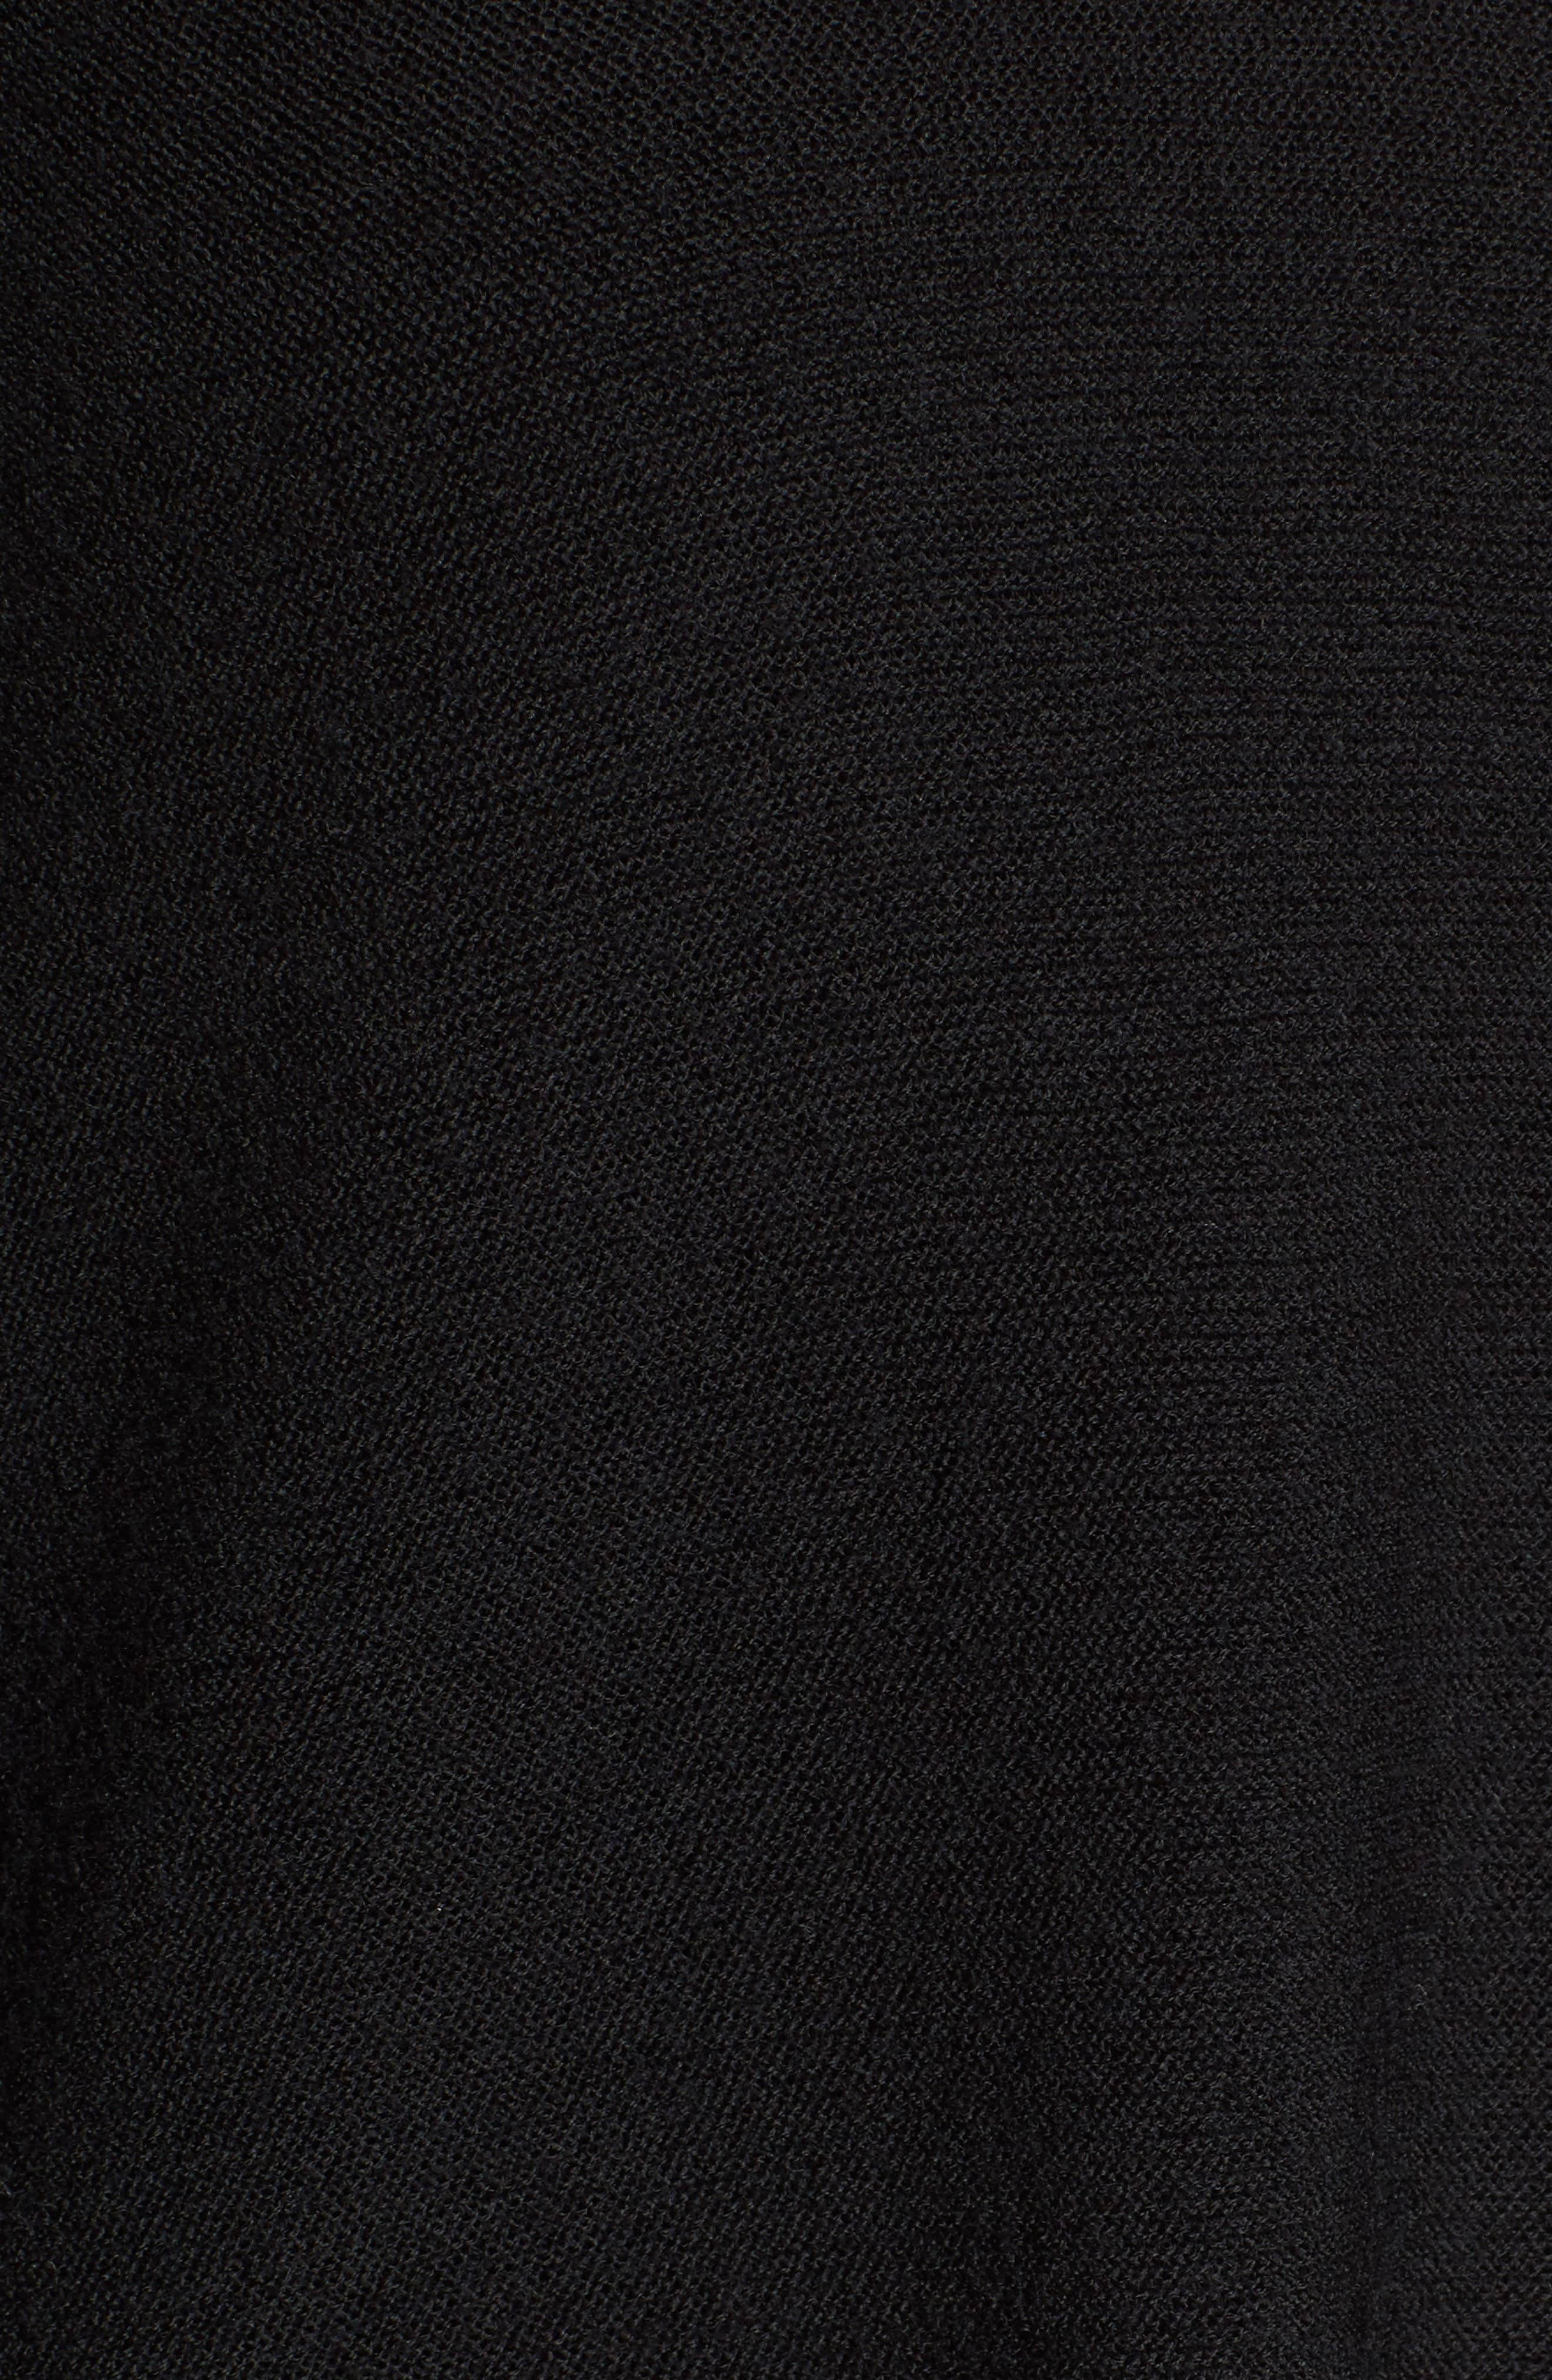 High/Low Merino Wool Sweater,                             Alternate thumbnail 5, color,                             001